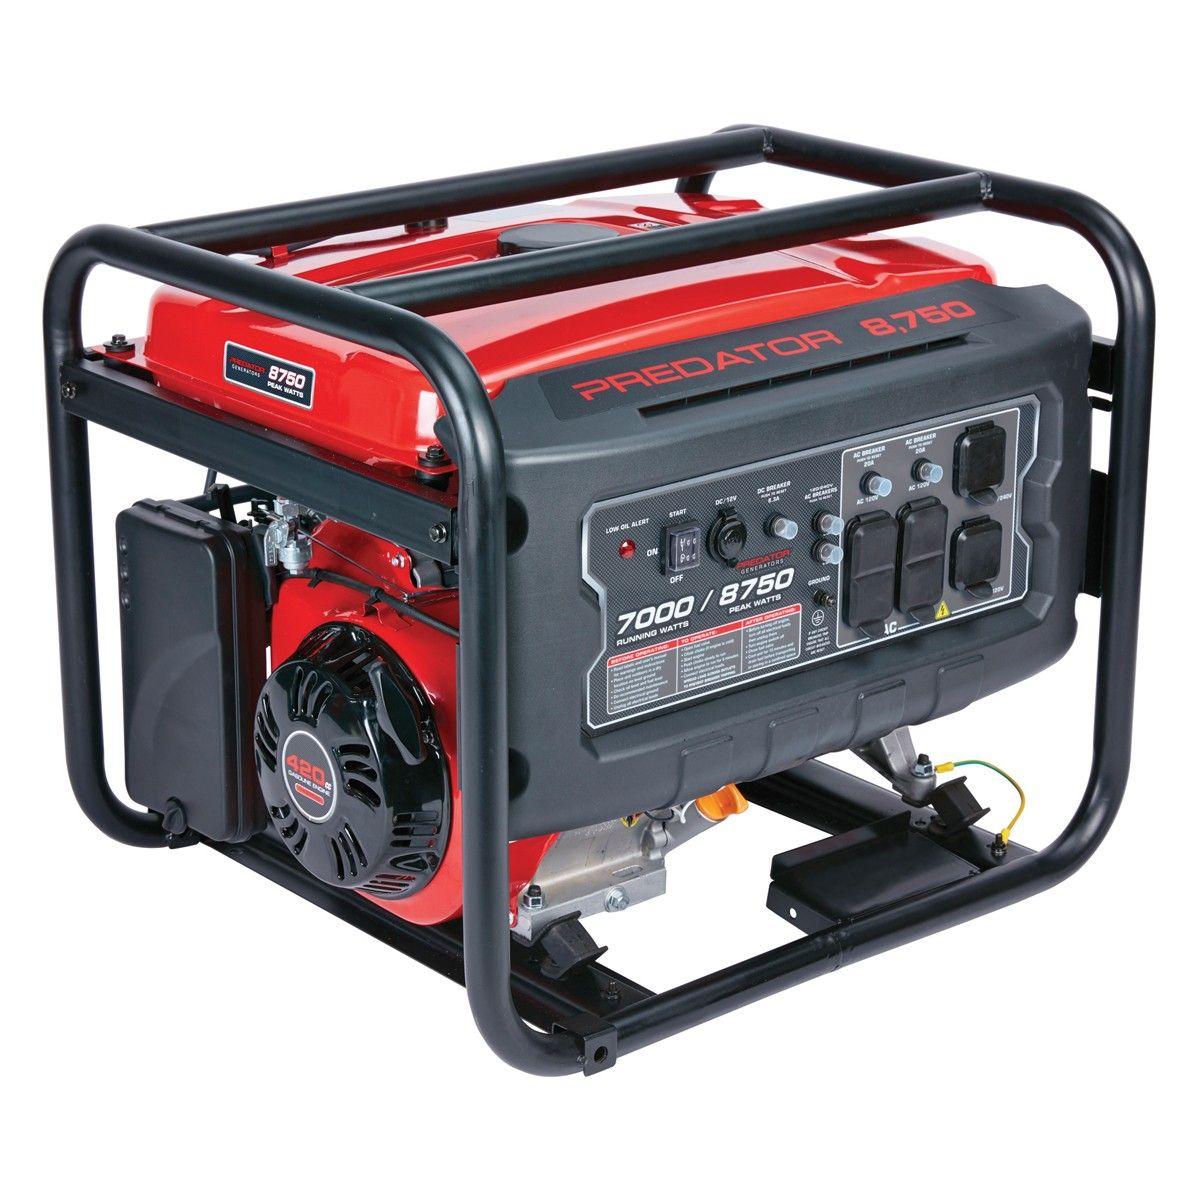 8750 Watt Max Starting Gas Powered Generator CARB Gas